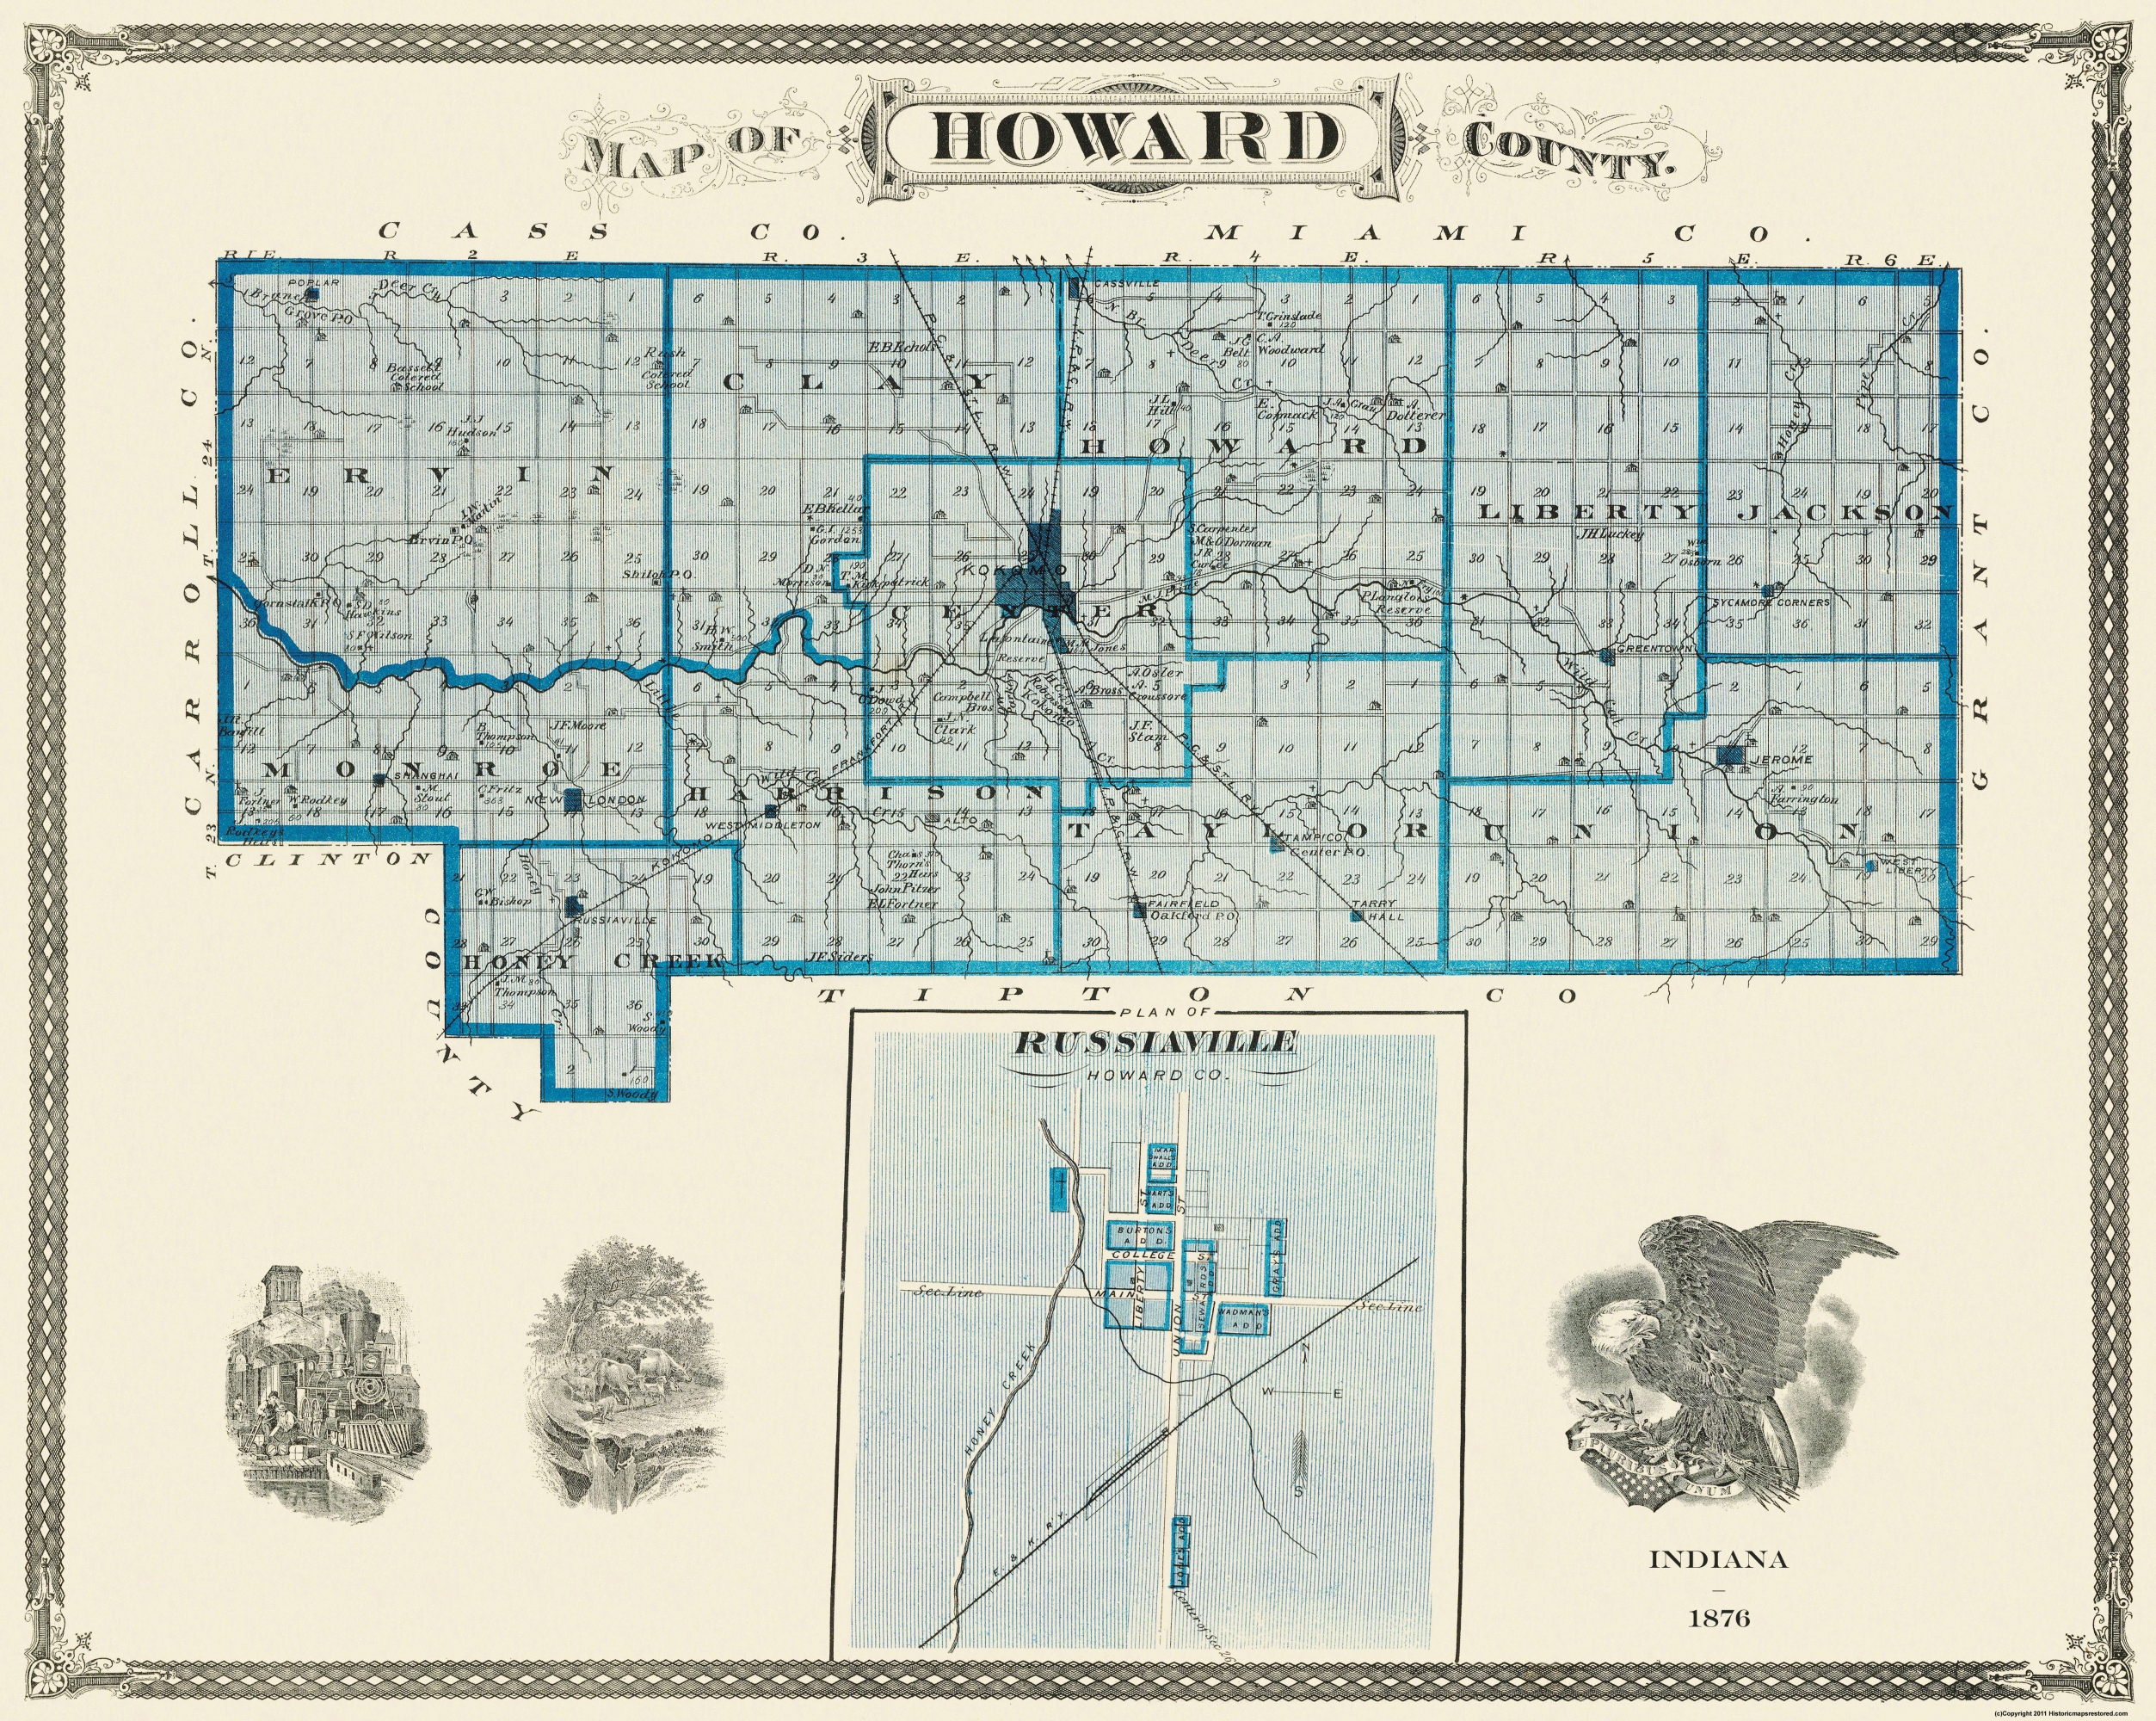 Howard County Indiana Map.Old County Map Howard Indiana Landowner 1876 28 81 X 23